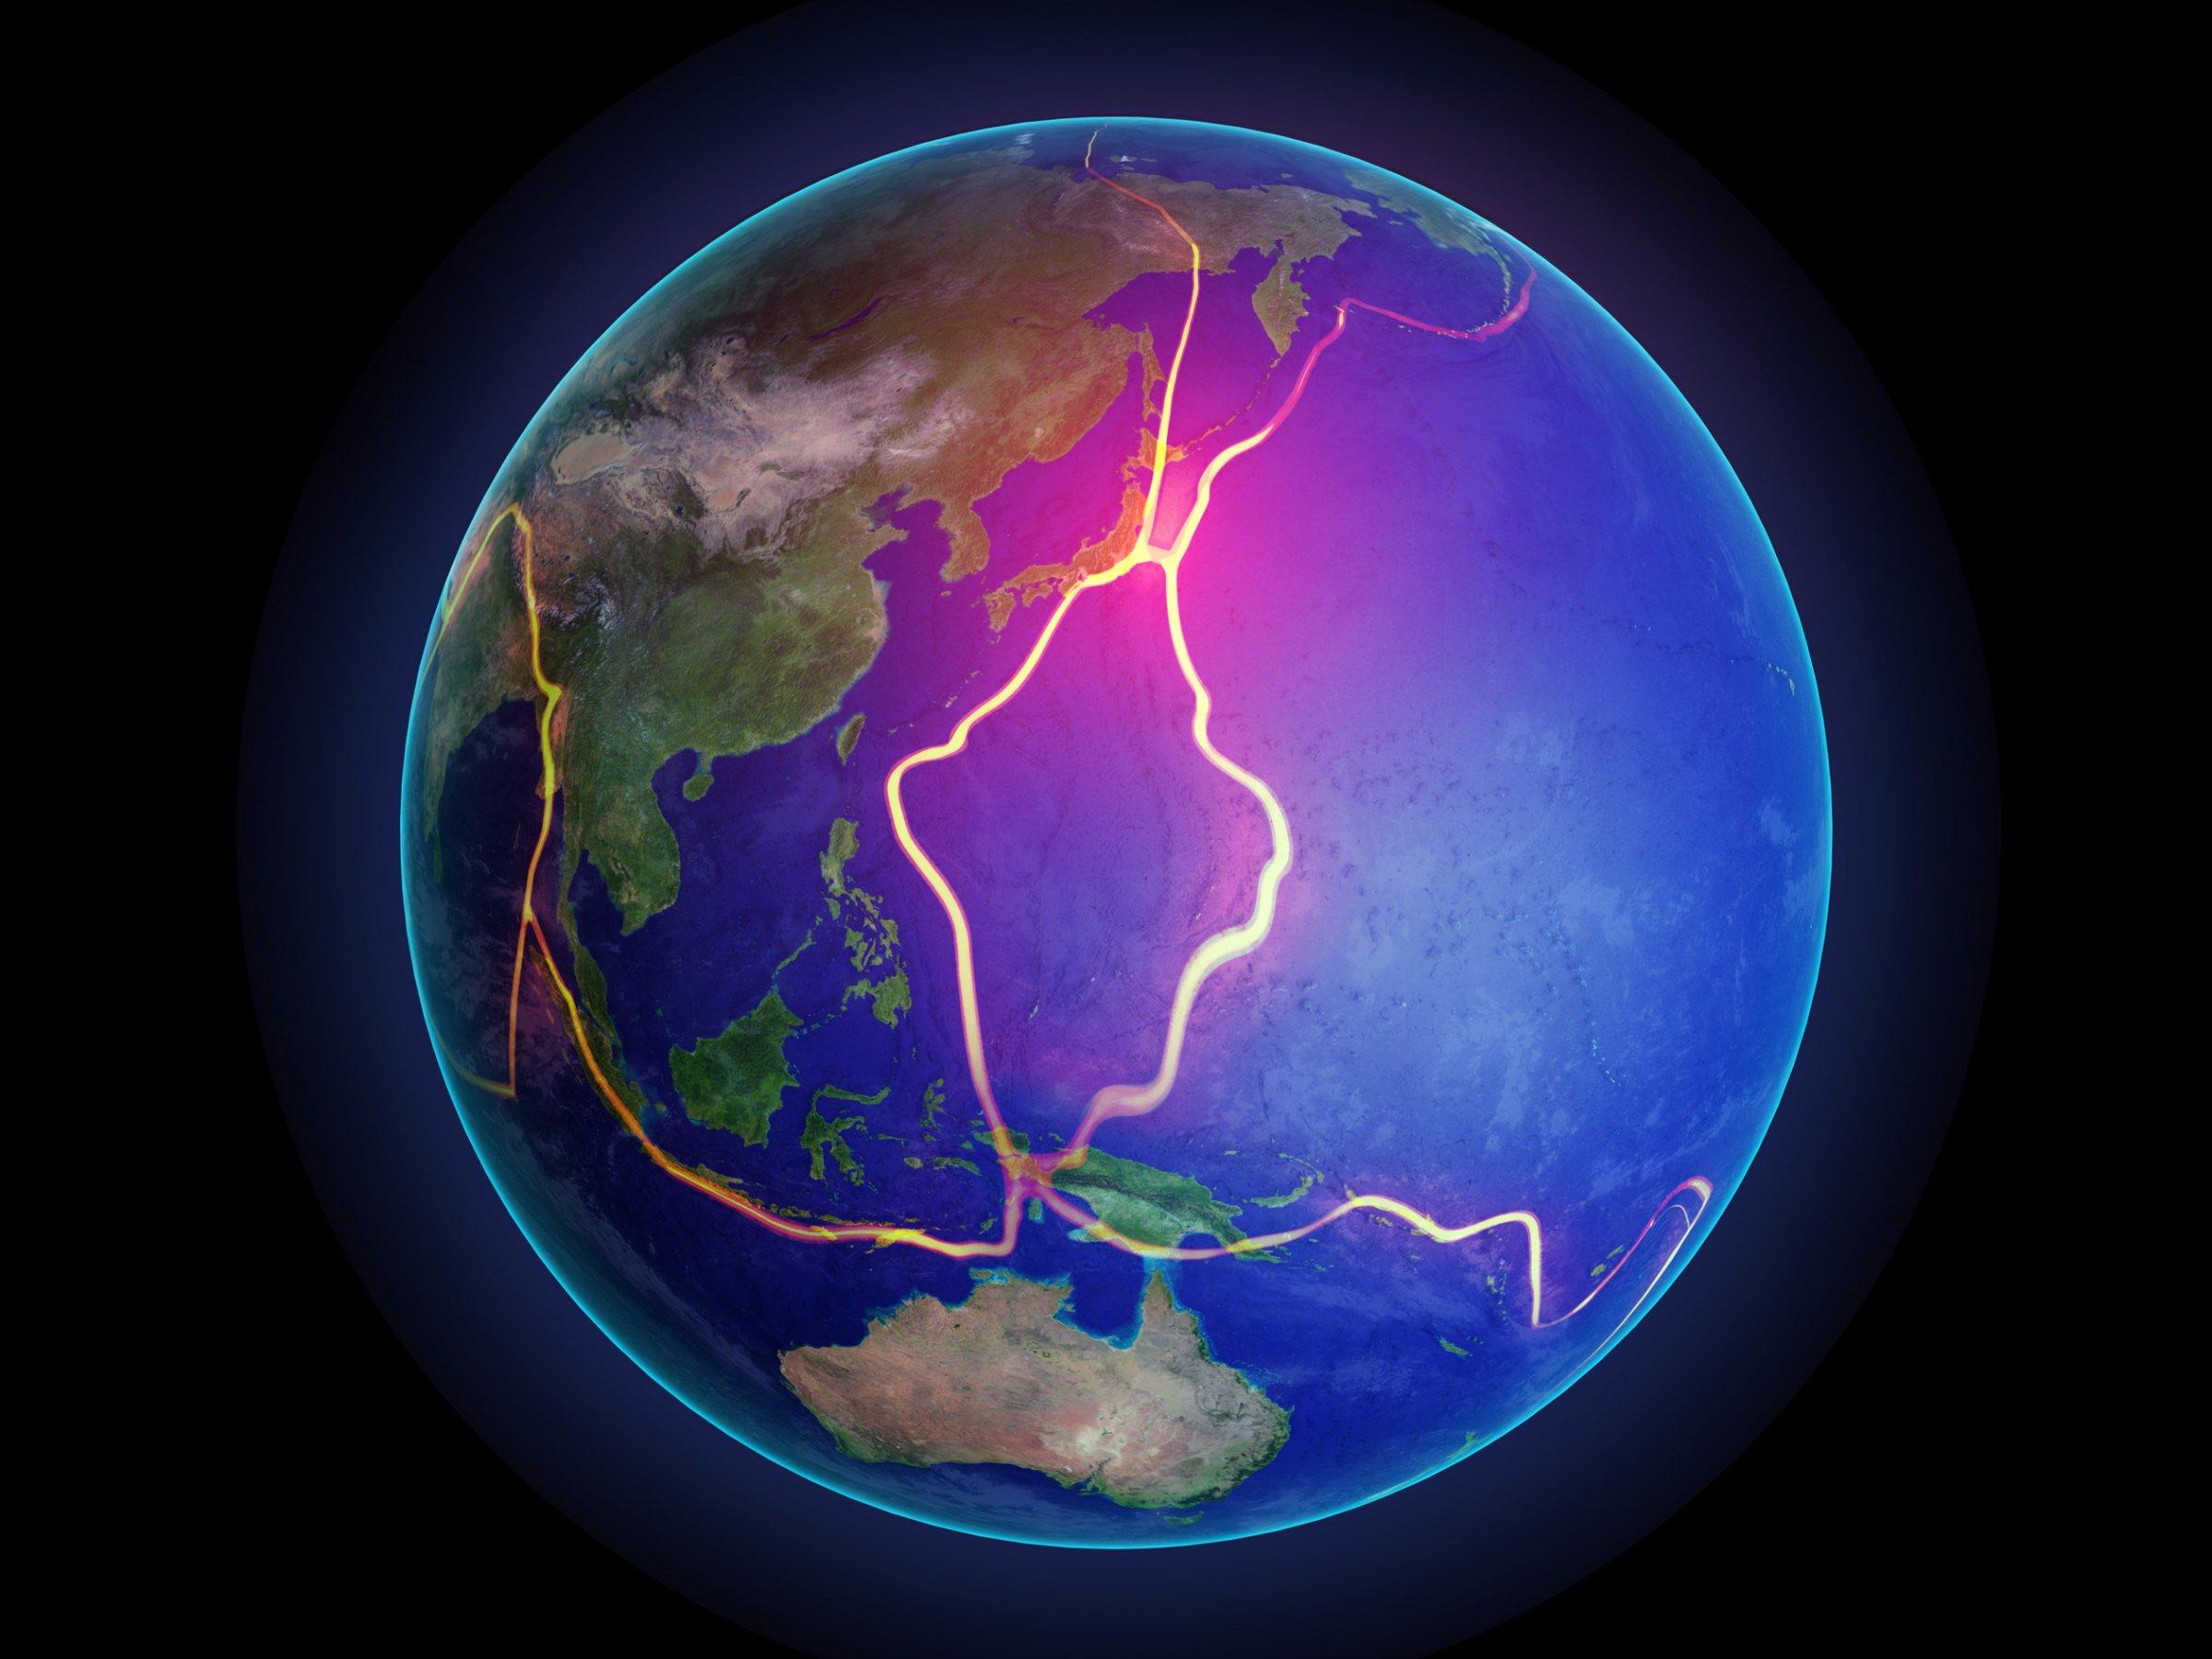 Landmasse Erde